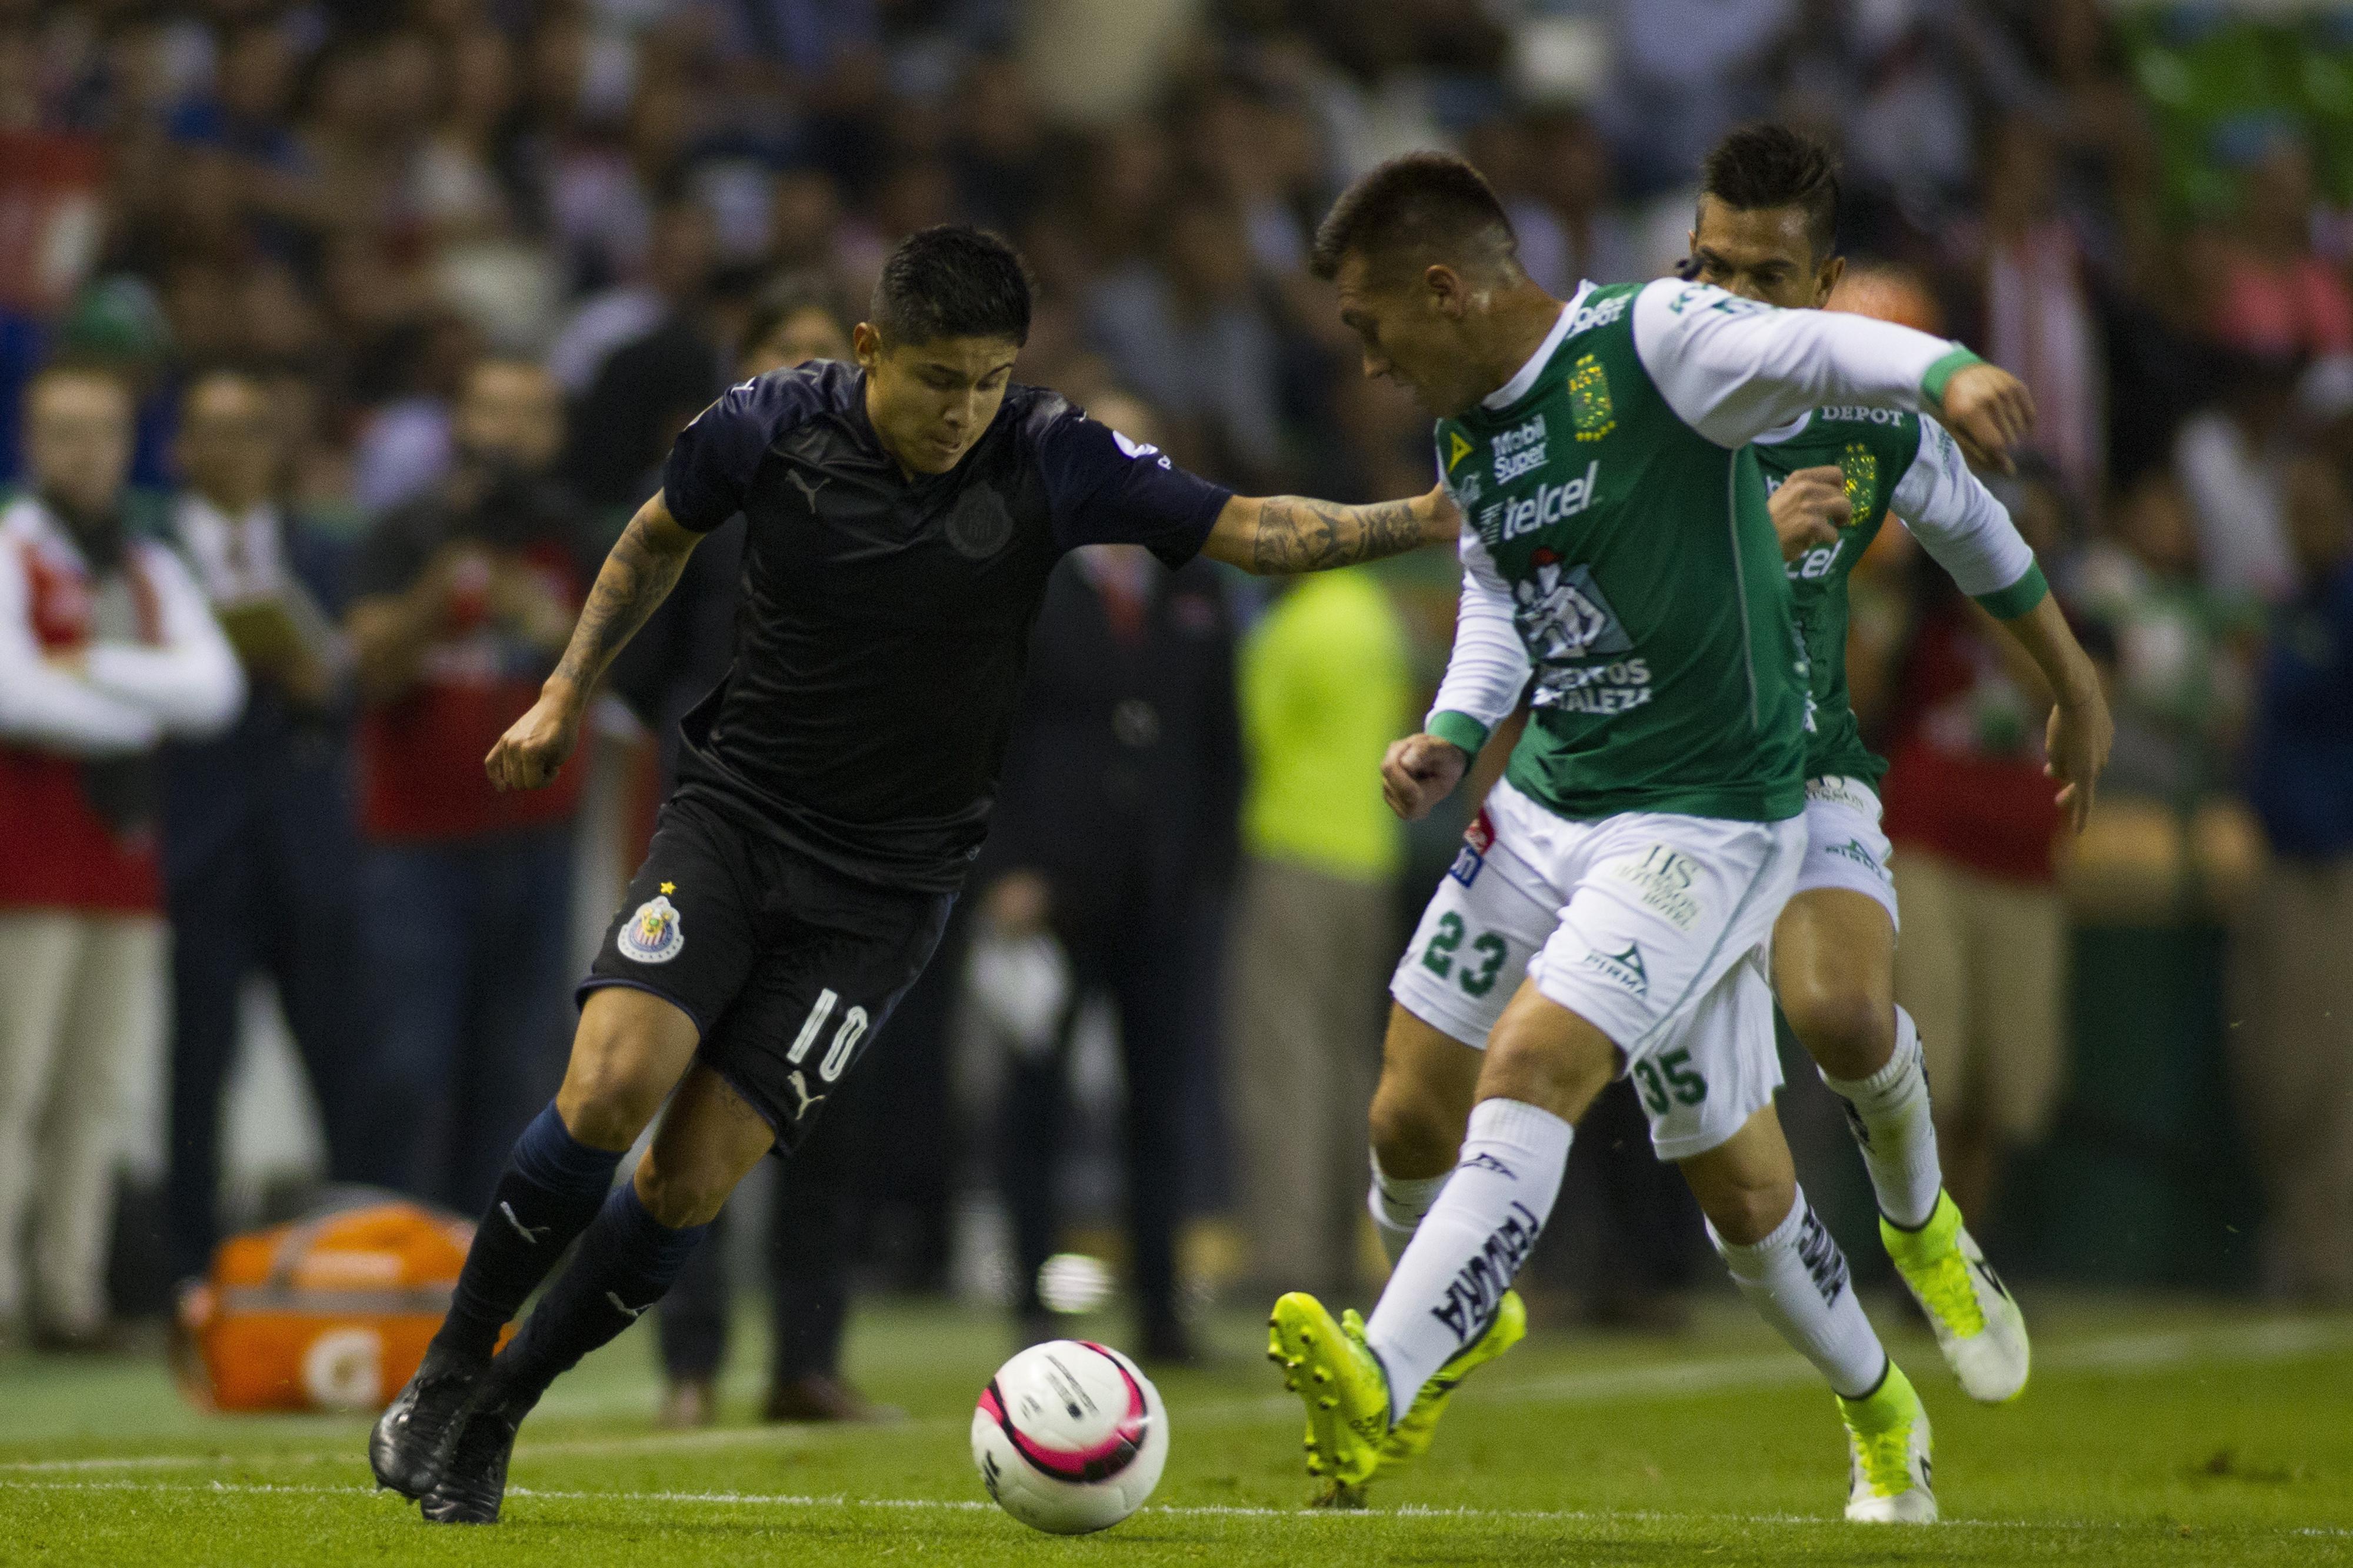 Matías Almeyda Chivas Chofis López Javier Eduardo López Guadalajara Chofis y Almeyda Pelado Almeyda Chivas Clausura 2018